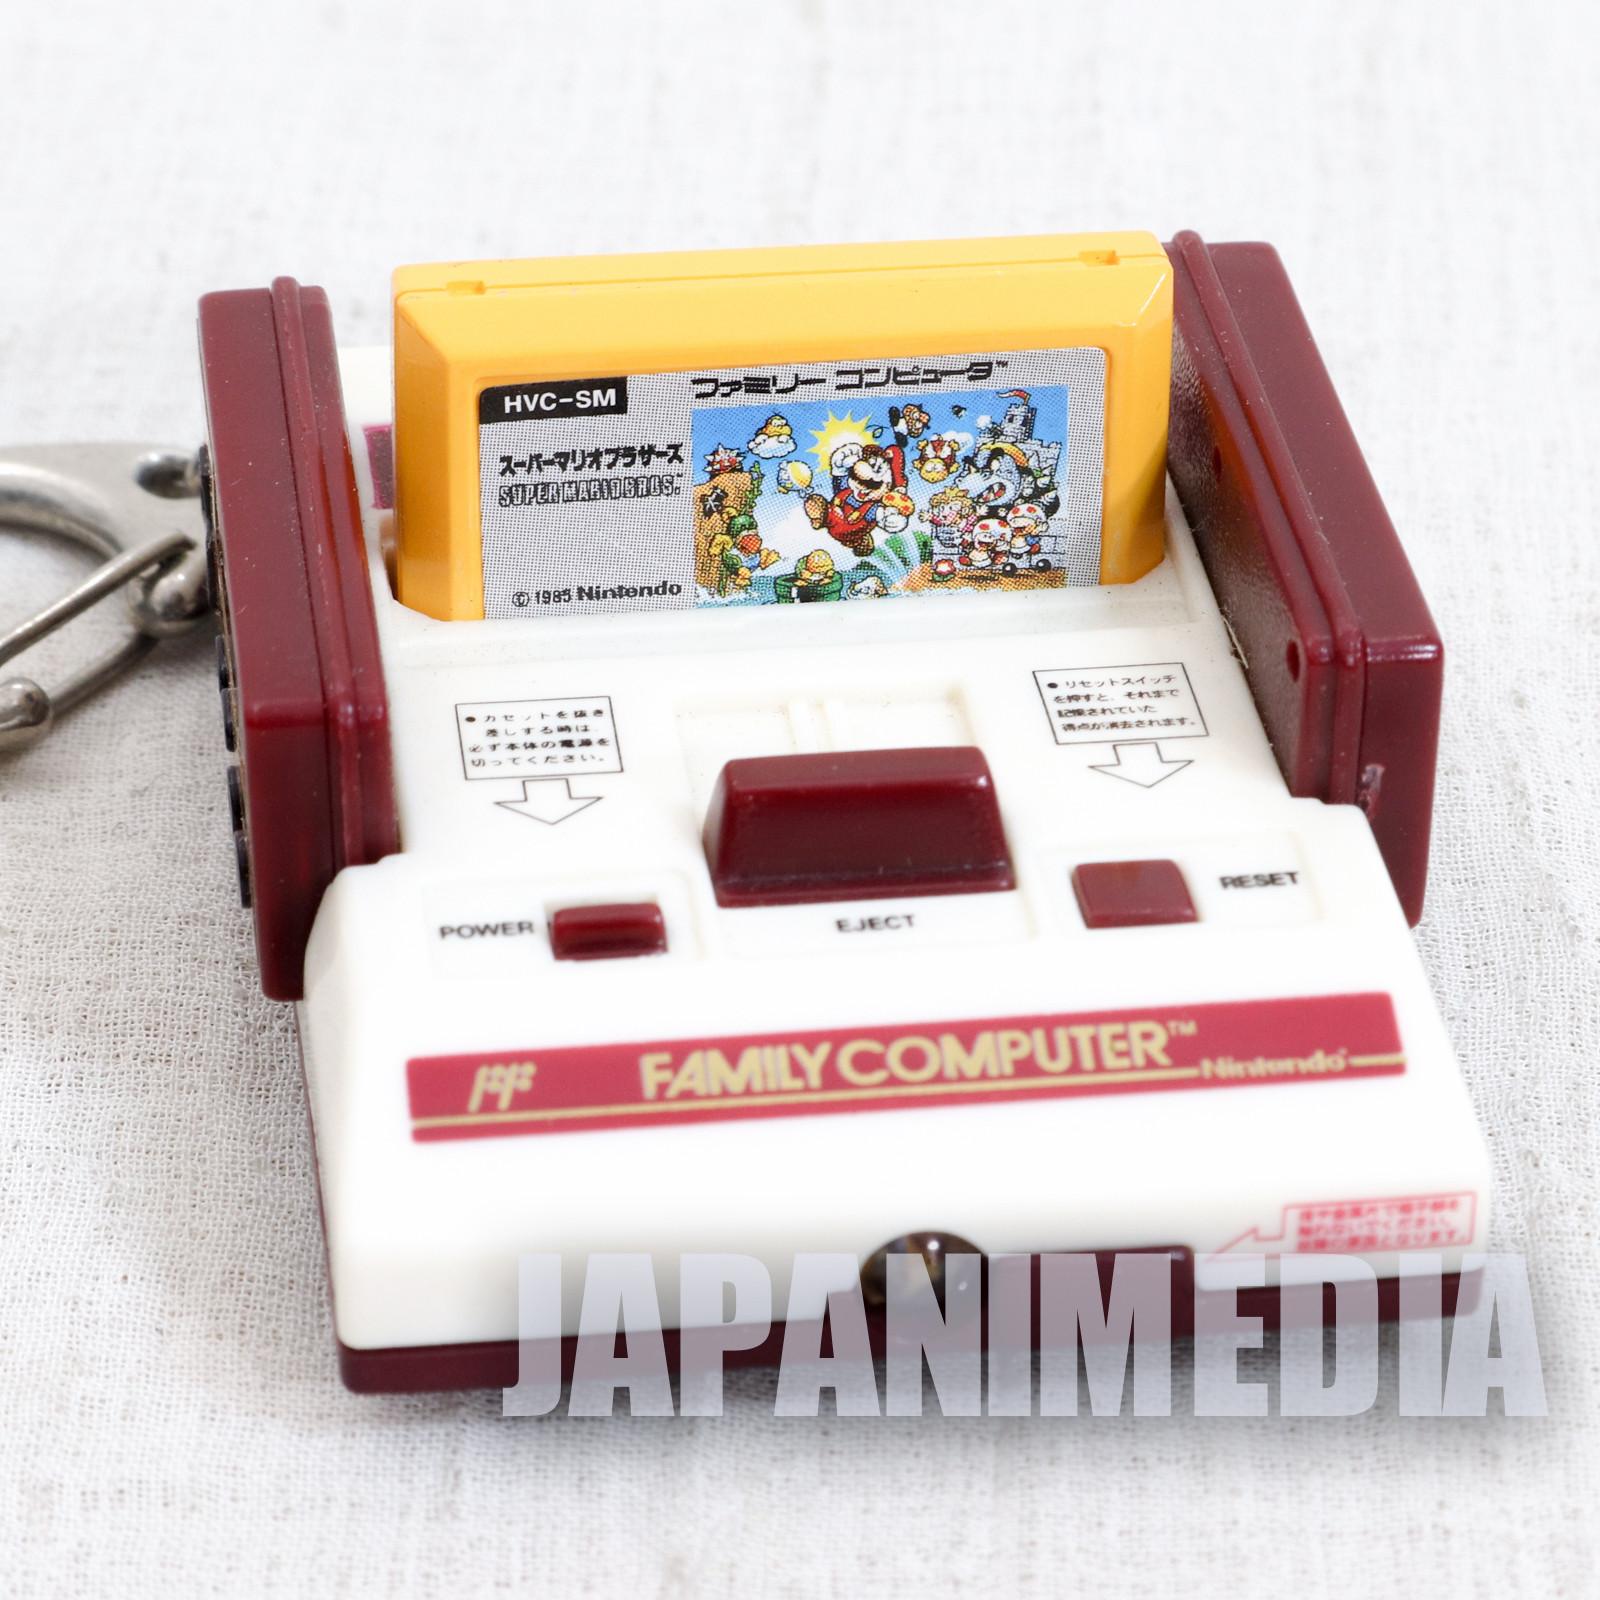 (JUNK ITEM) Nintendo Family Computer Super Mario Cassette Figure Key Chain Famicom NES